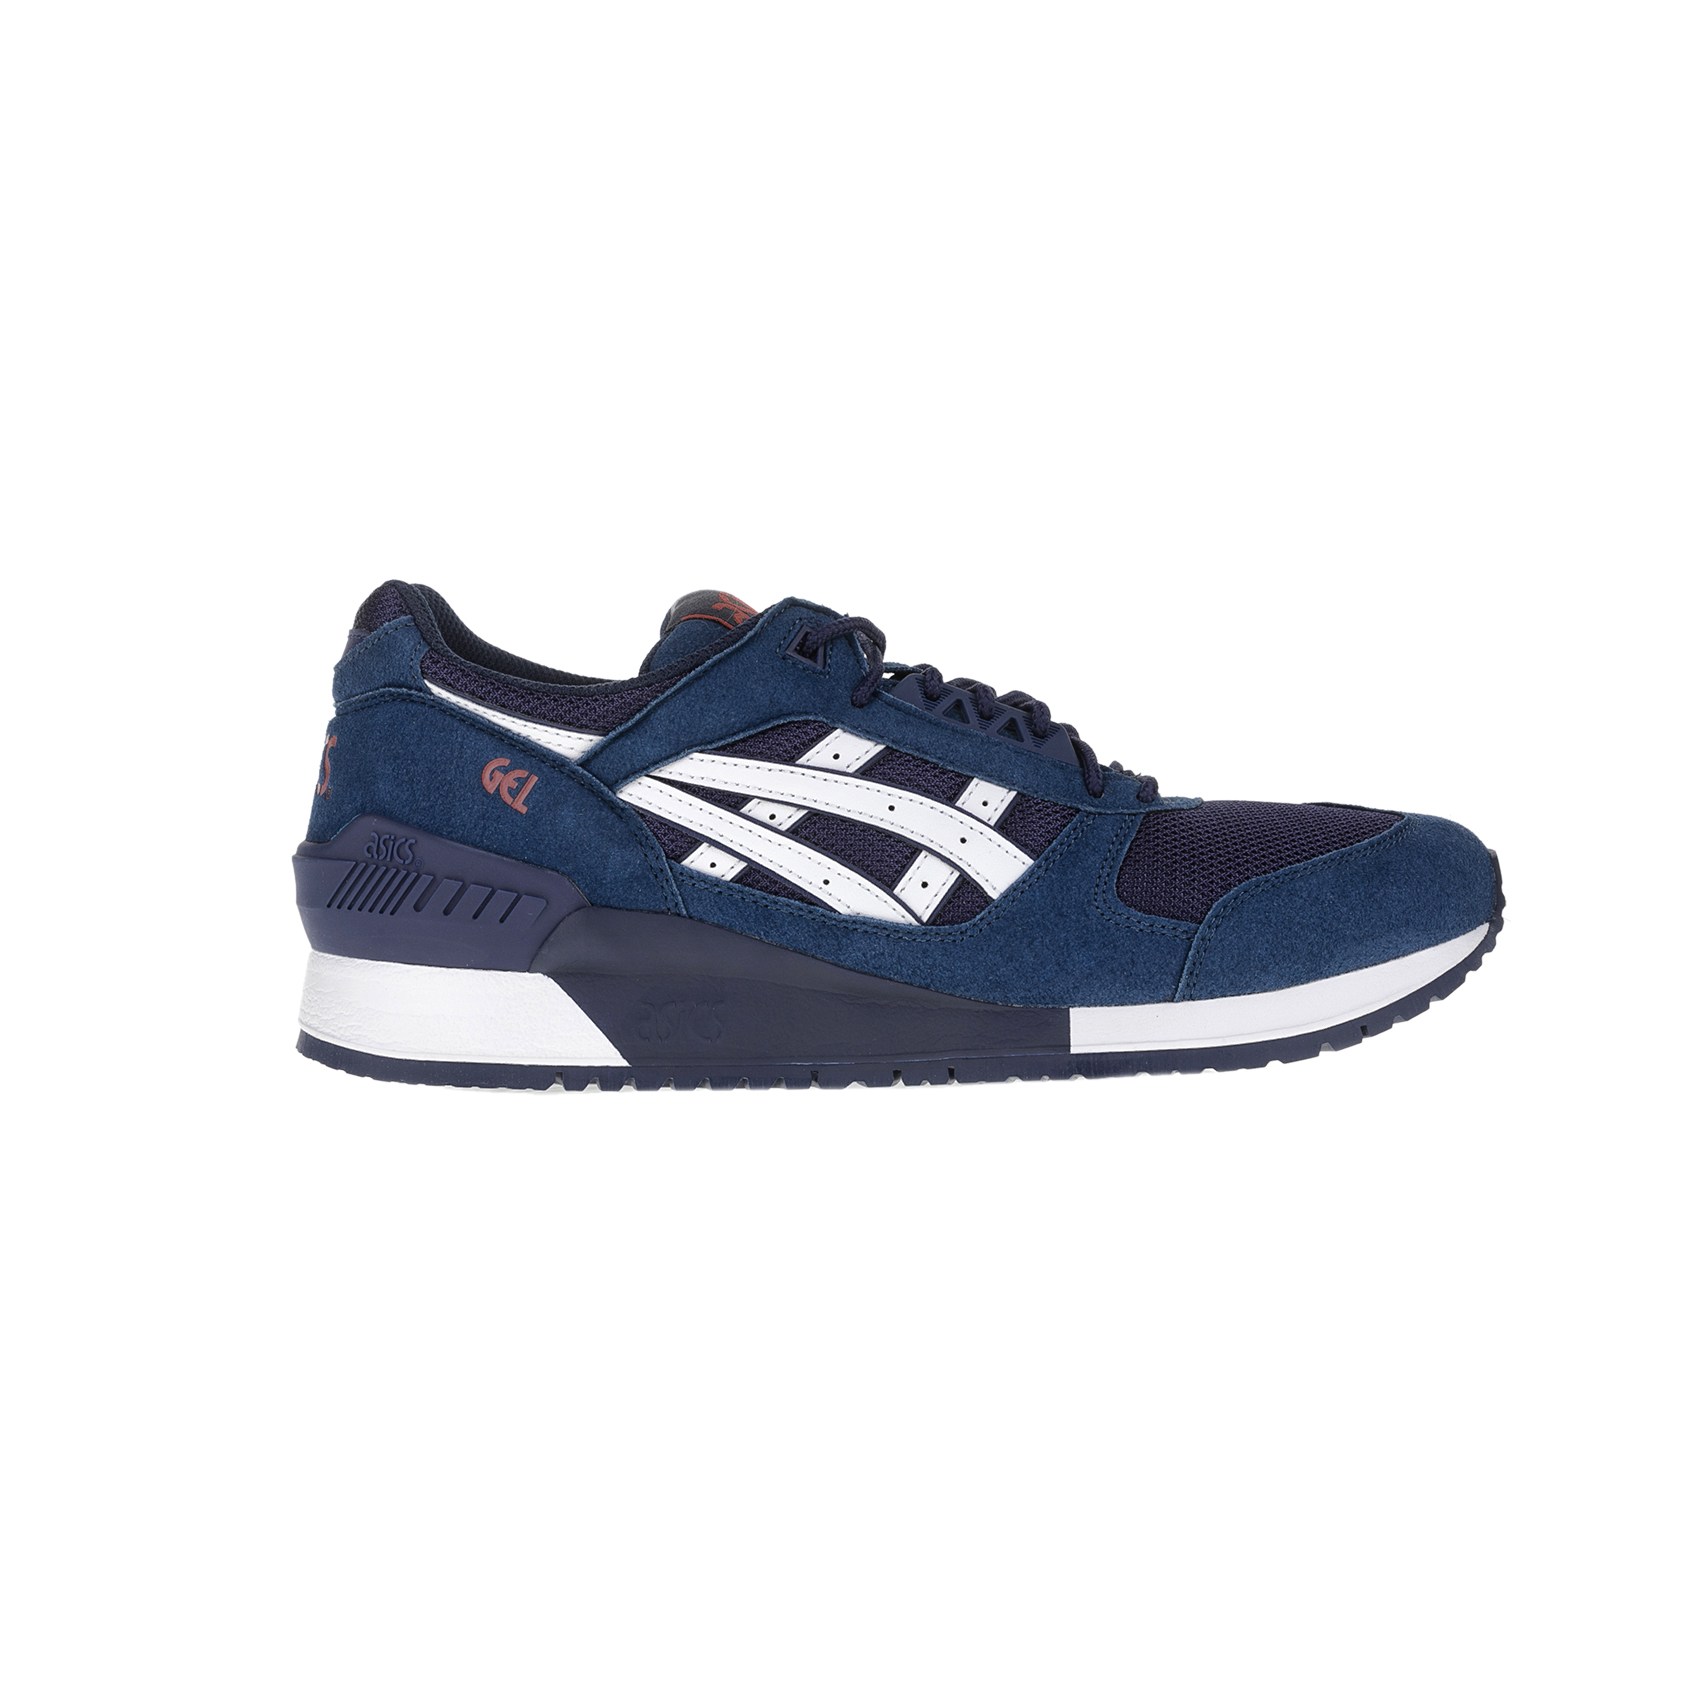 ASICS – Unisex παπούτσια ASICS GEL-RESPECTOR μπλε